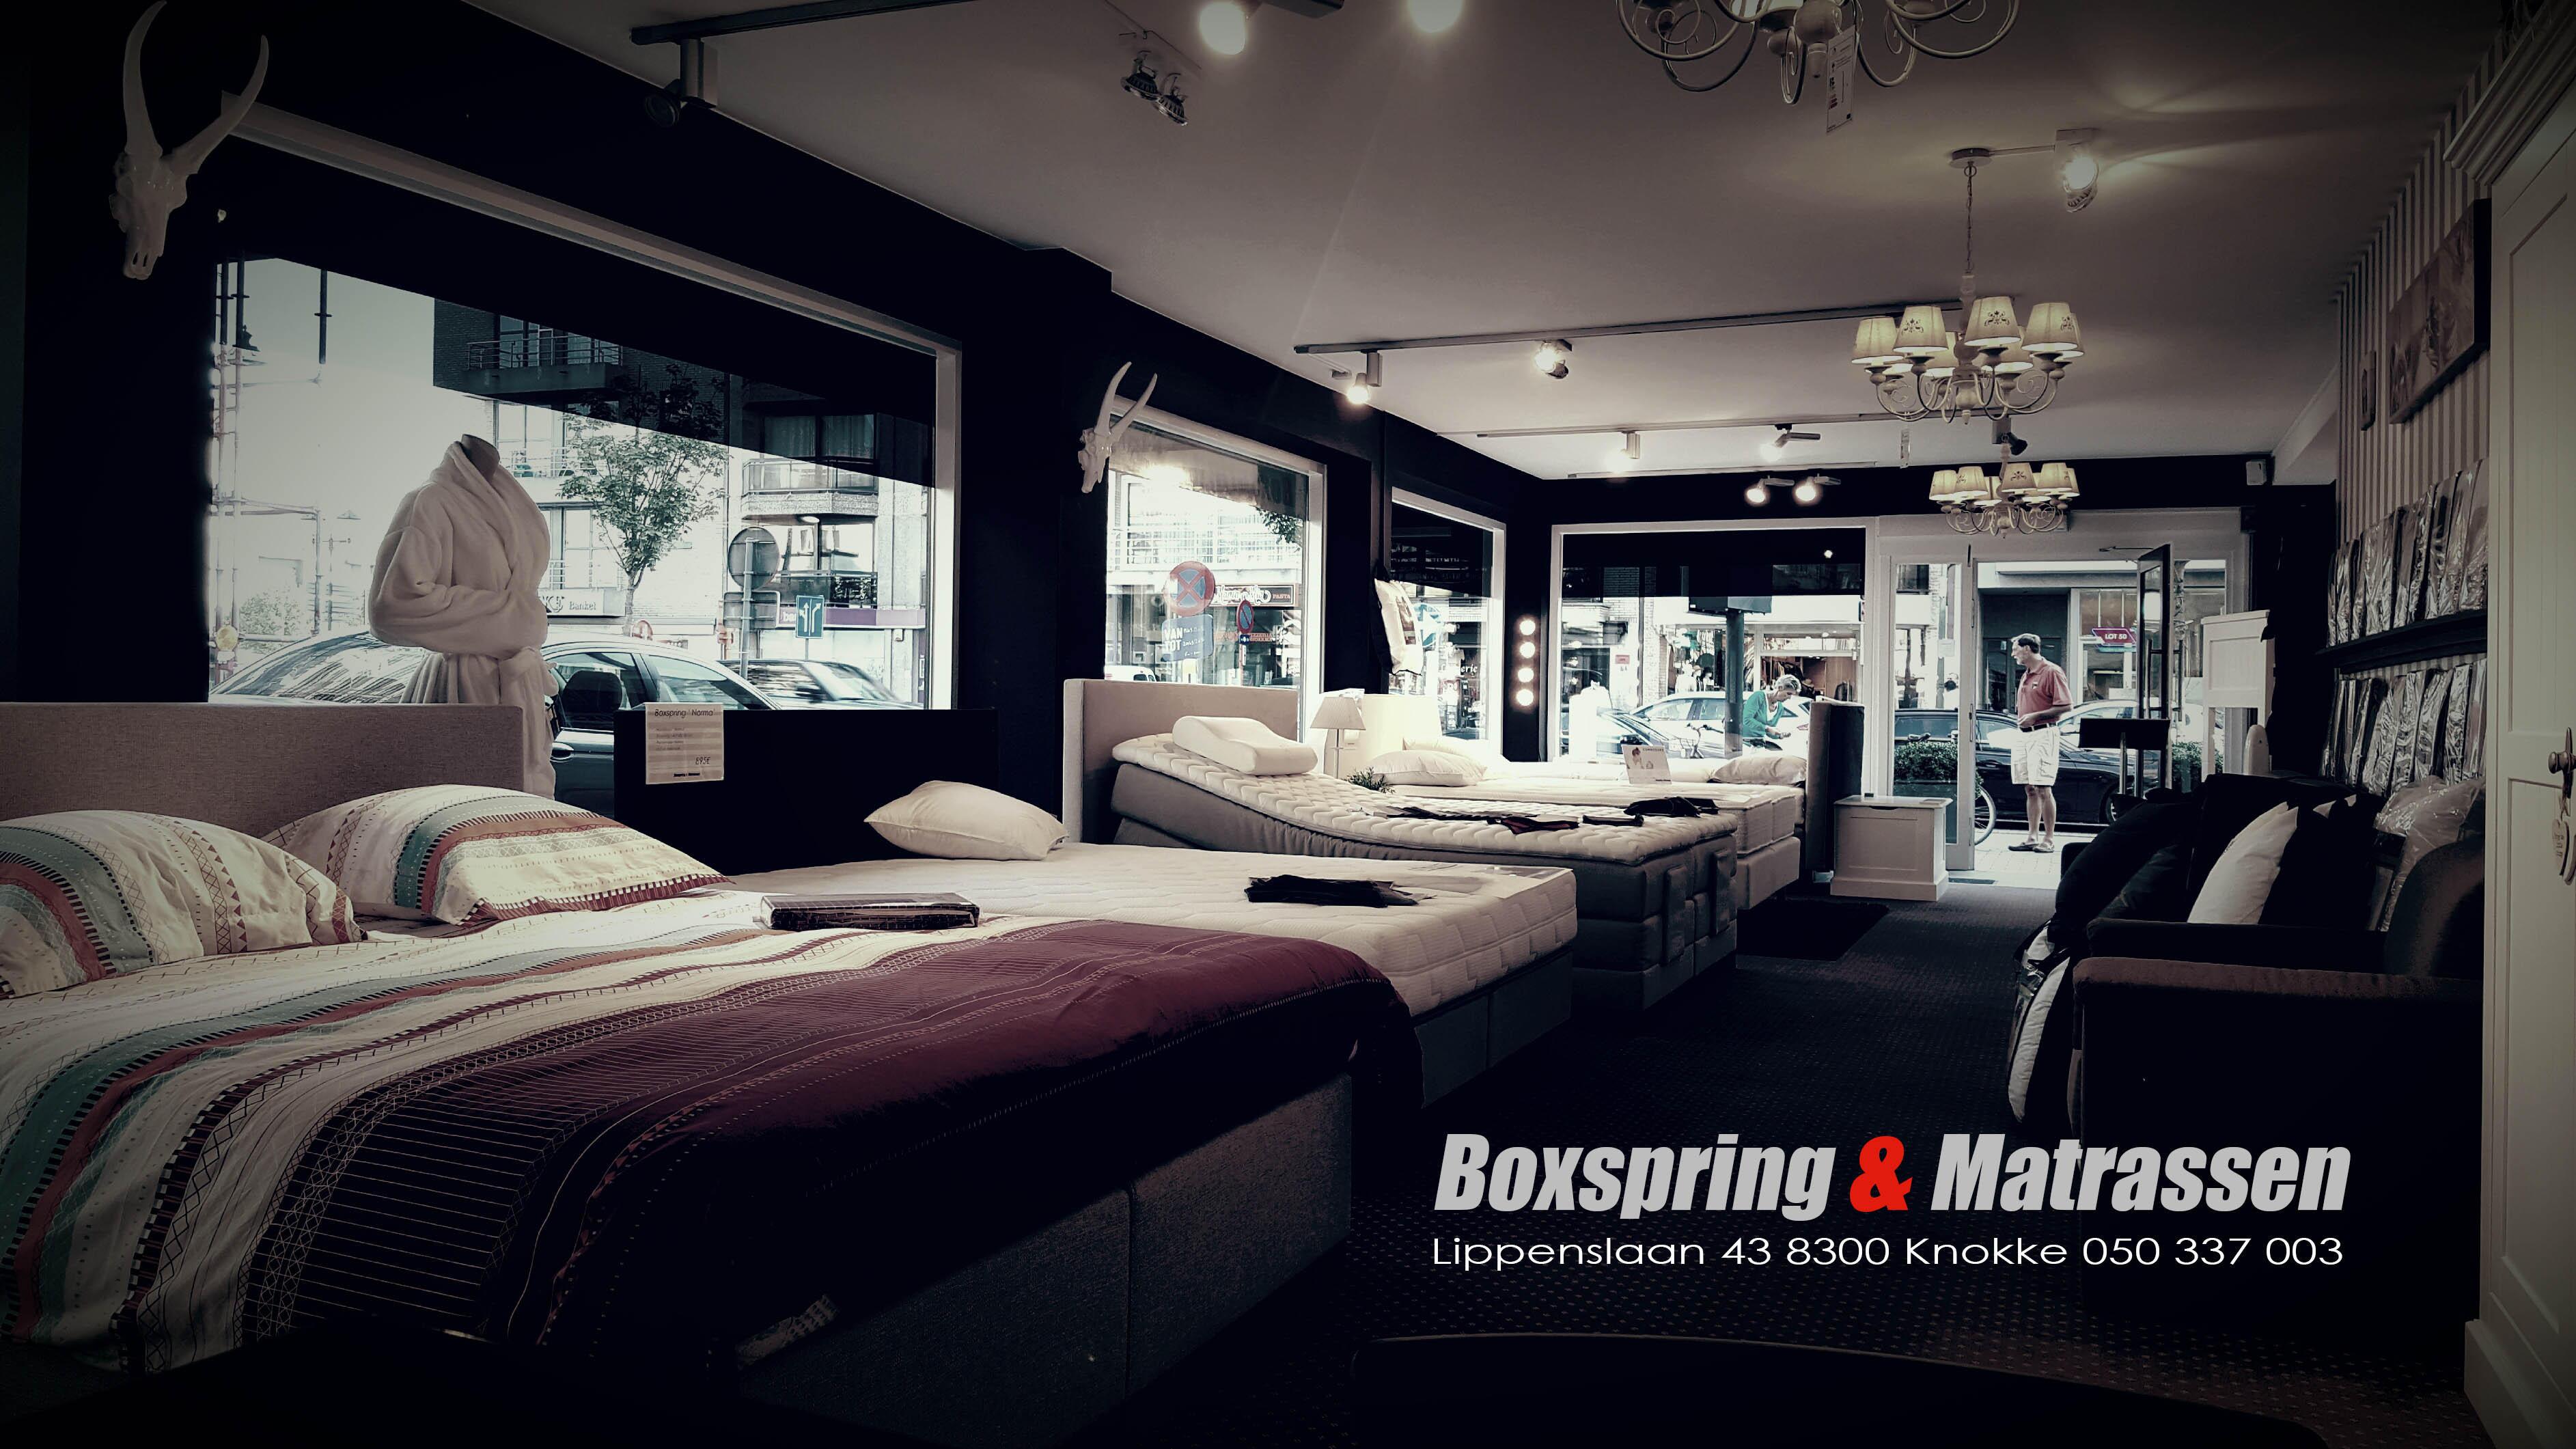 Boxspring & Matrassen